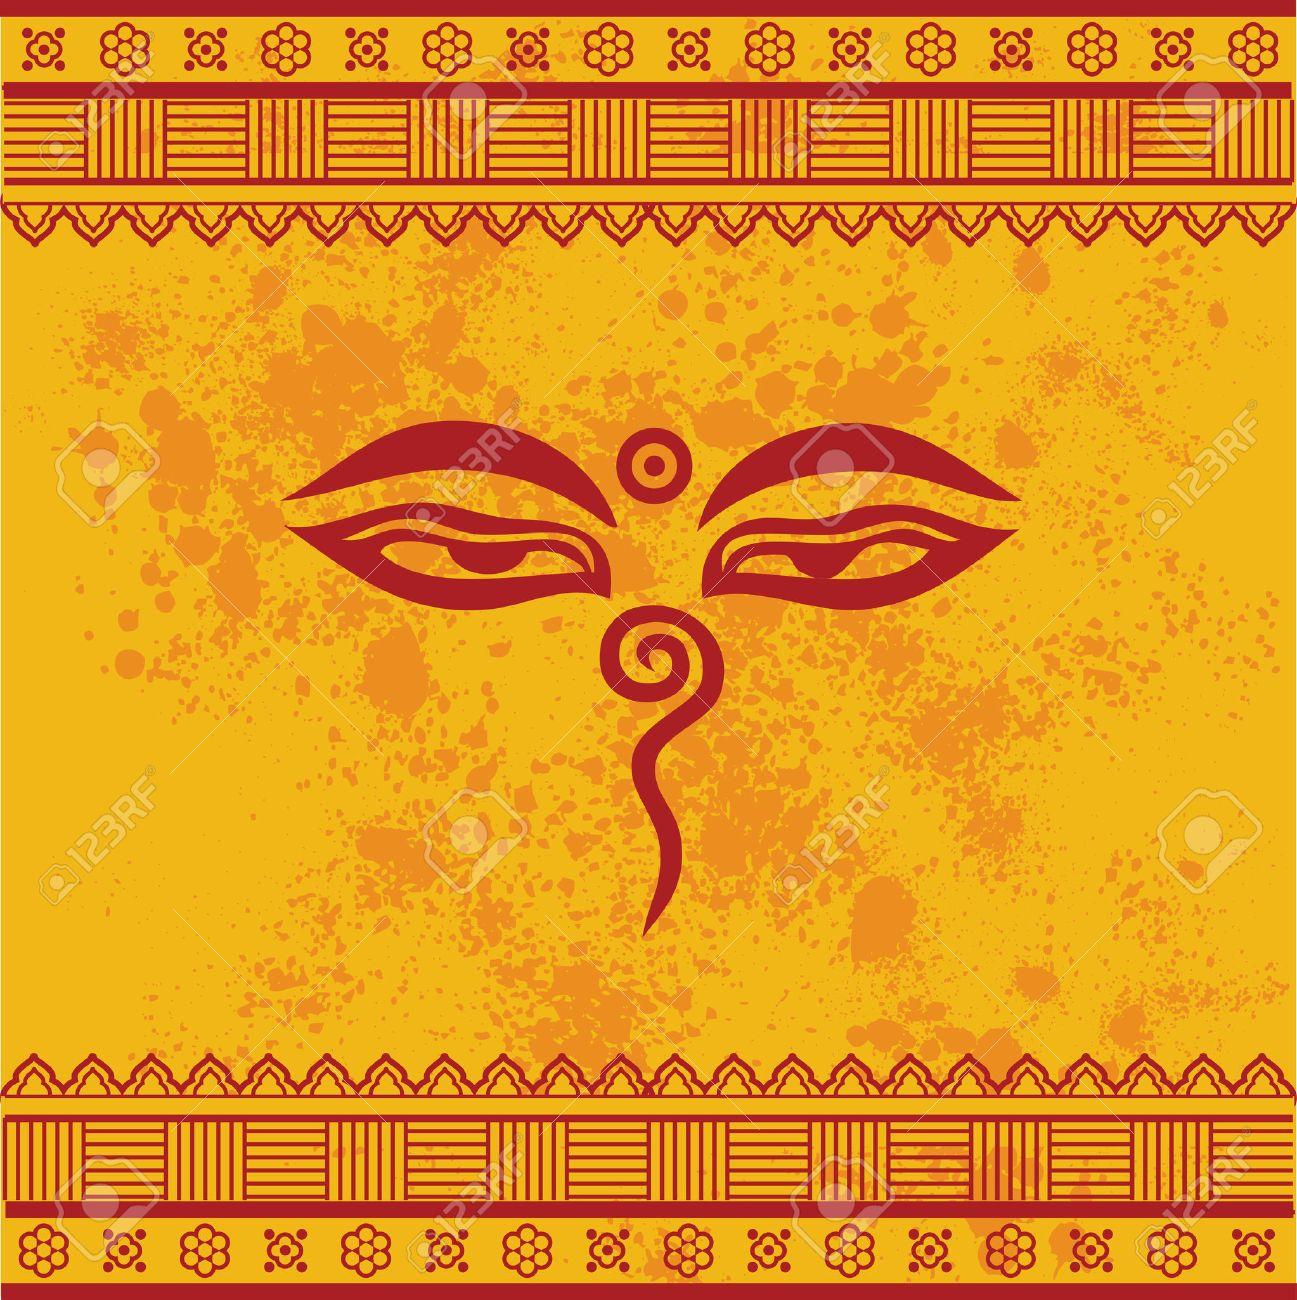 Traditional buddha eyes symbol on yellow textured background traditional buddha eyes symbol on yellow textured background with henna design borders stock vector 35448534 biocorpaavc Images